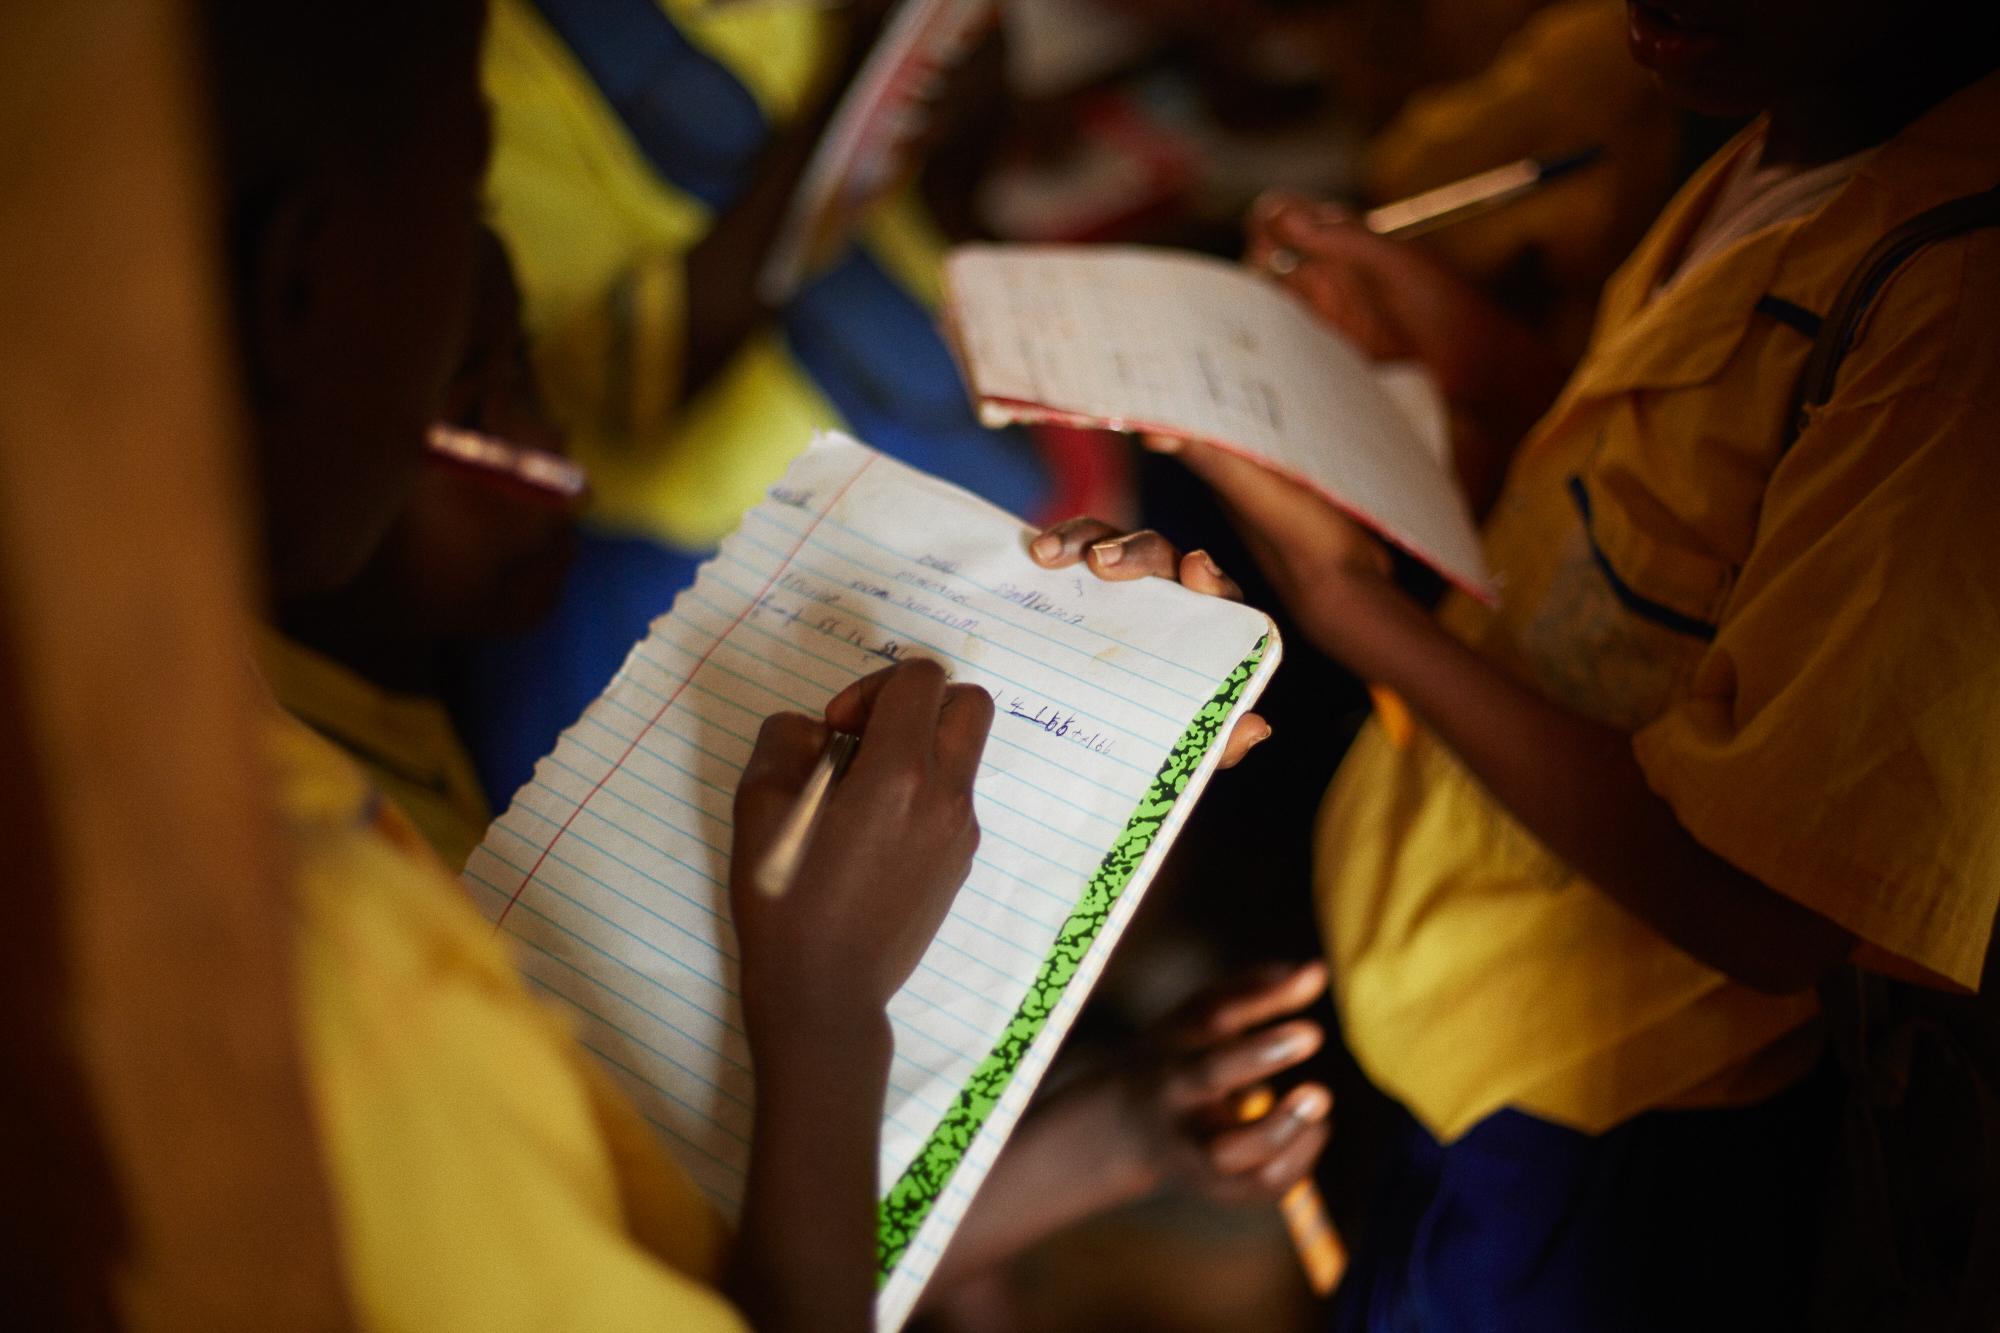 Educating children in emergencies